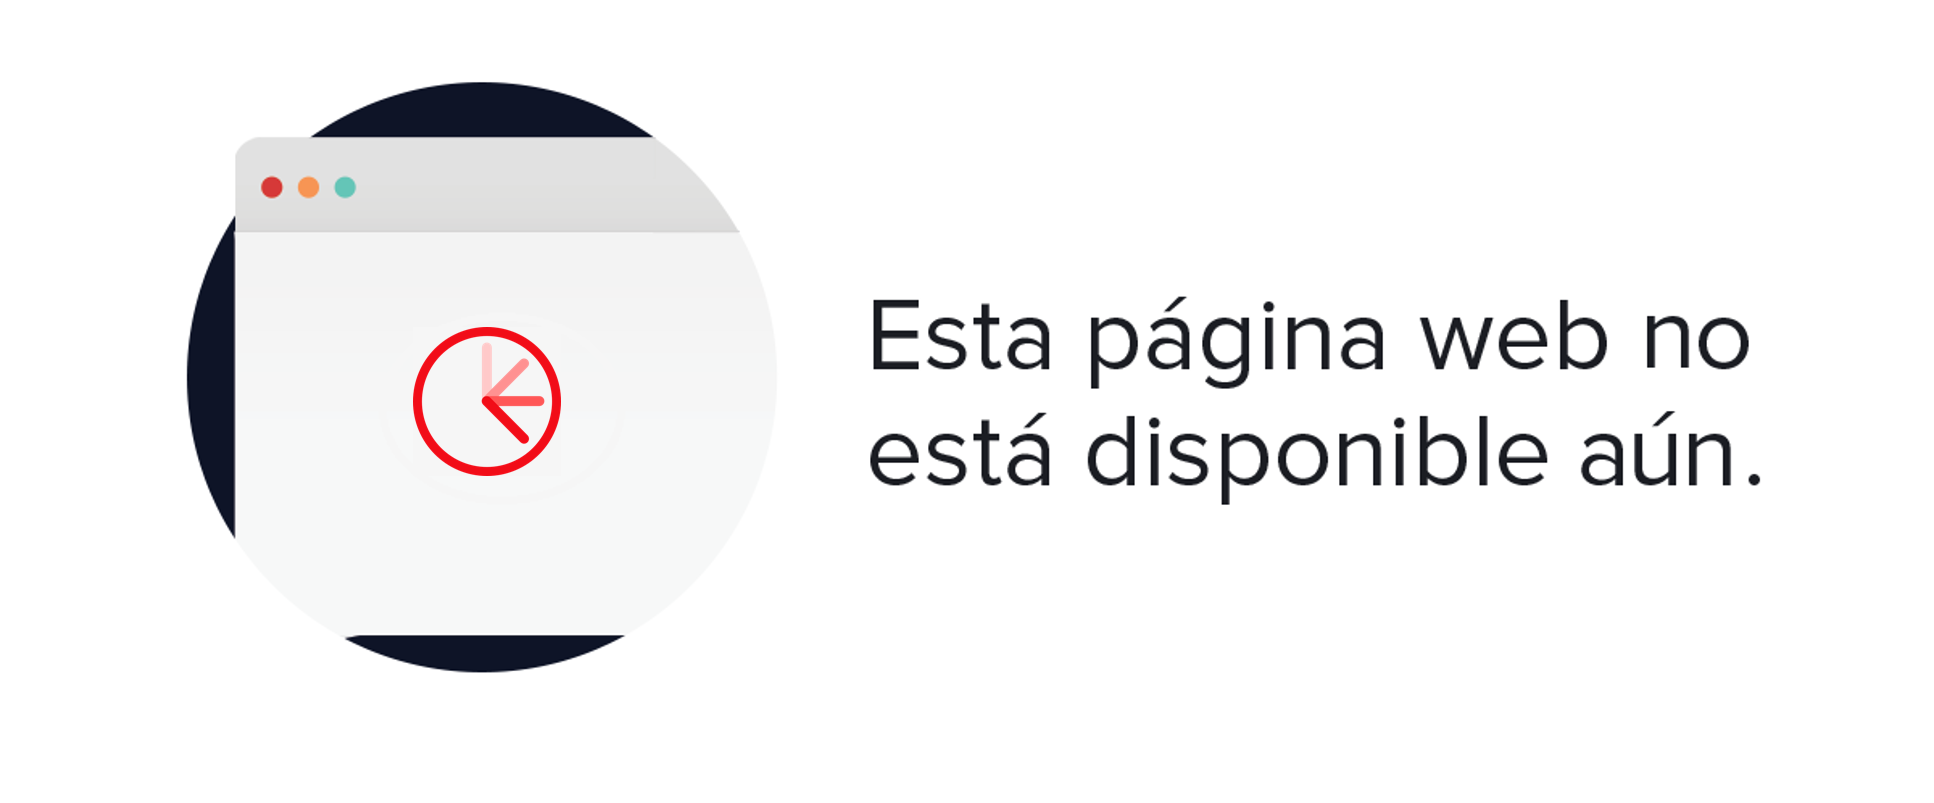 Premiata Blanco Zapatillas Deportivas Hombre 453114 - Barato - KZWPMRA